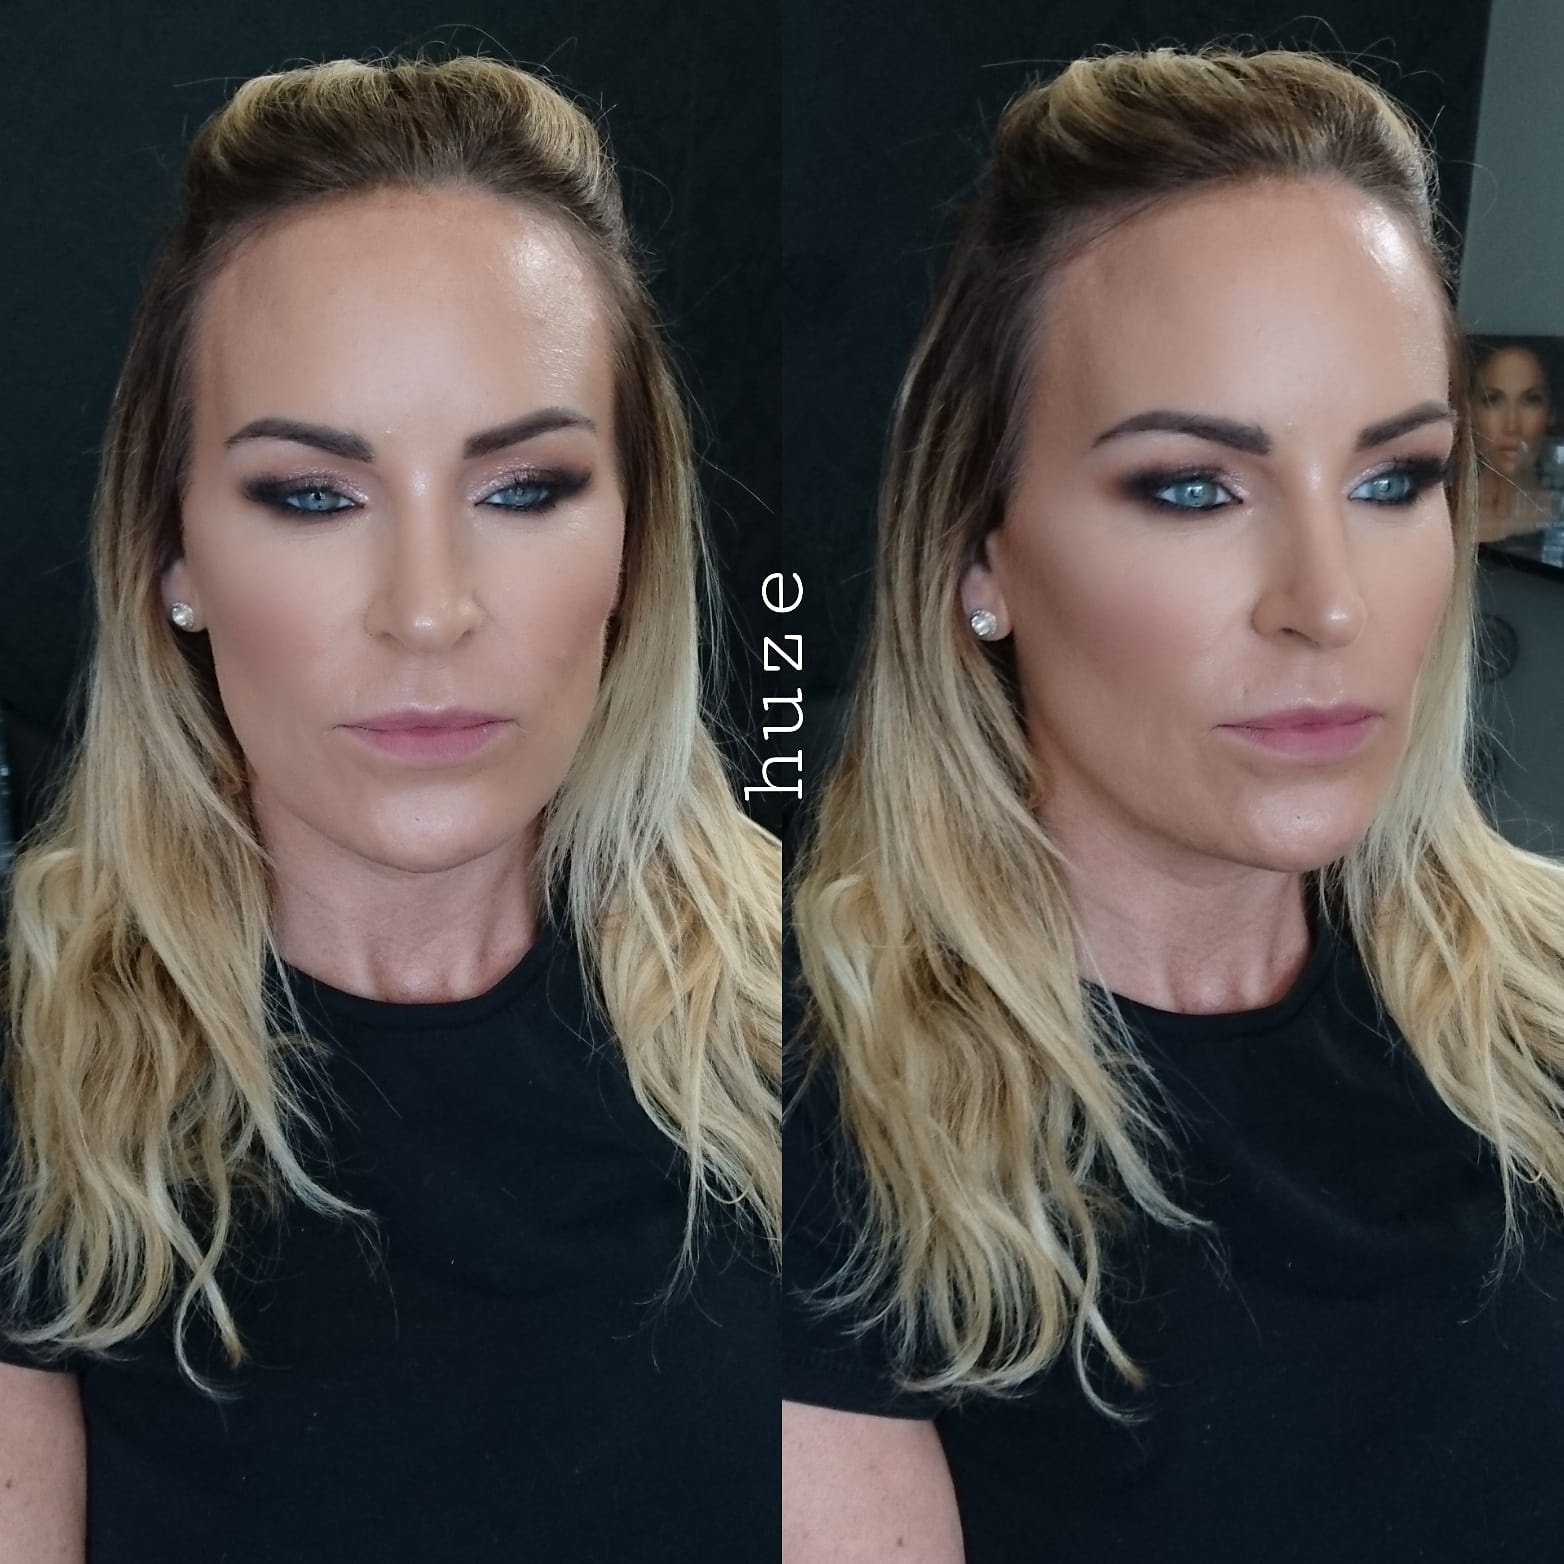 Airbrush Makeup 2020